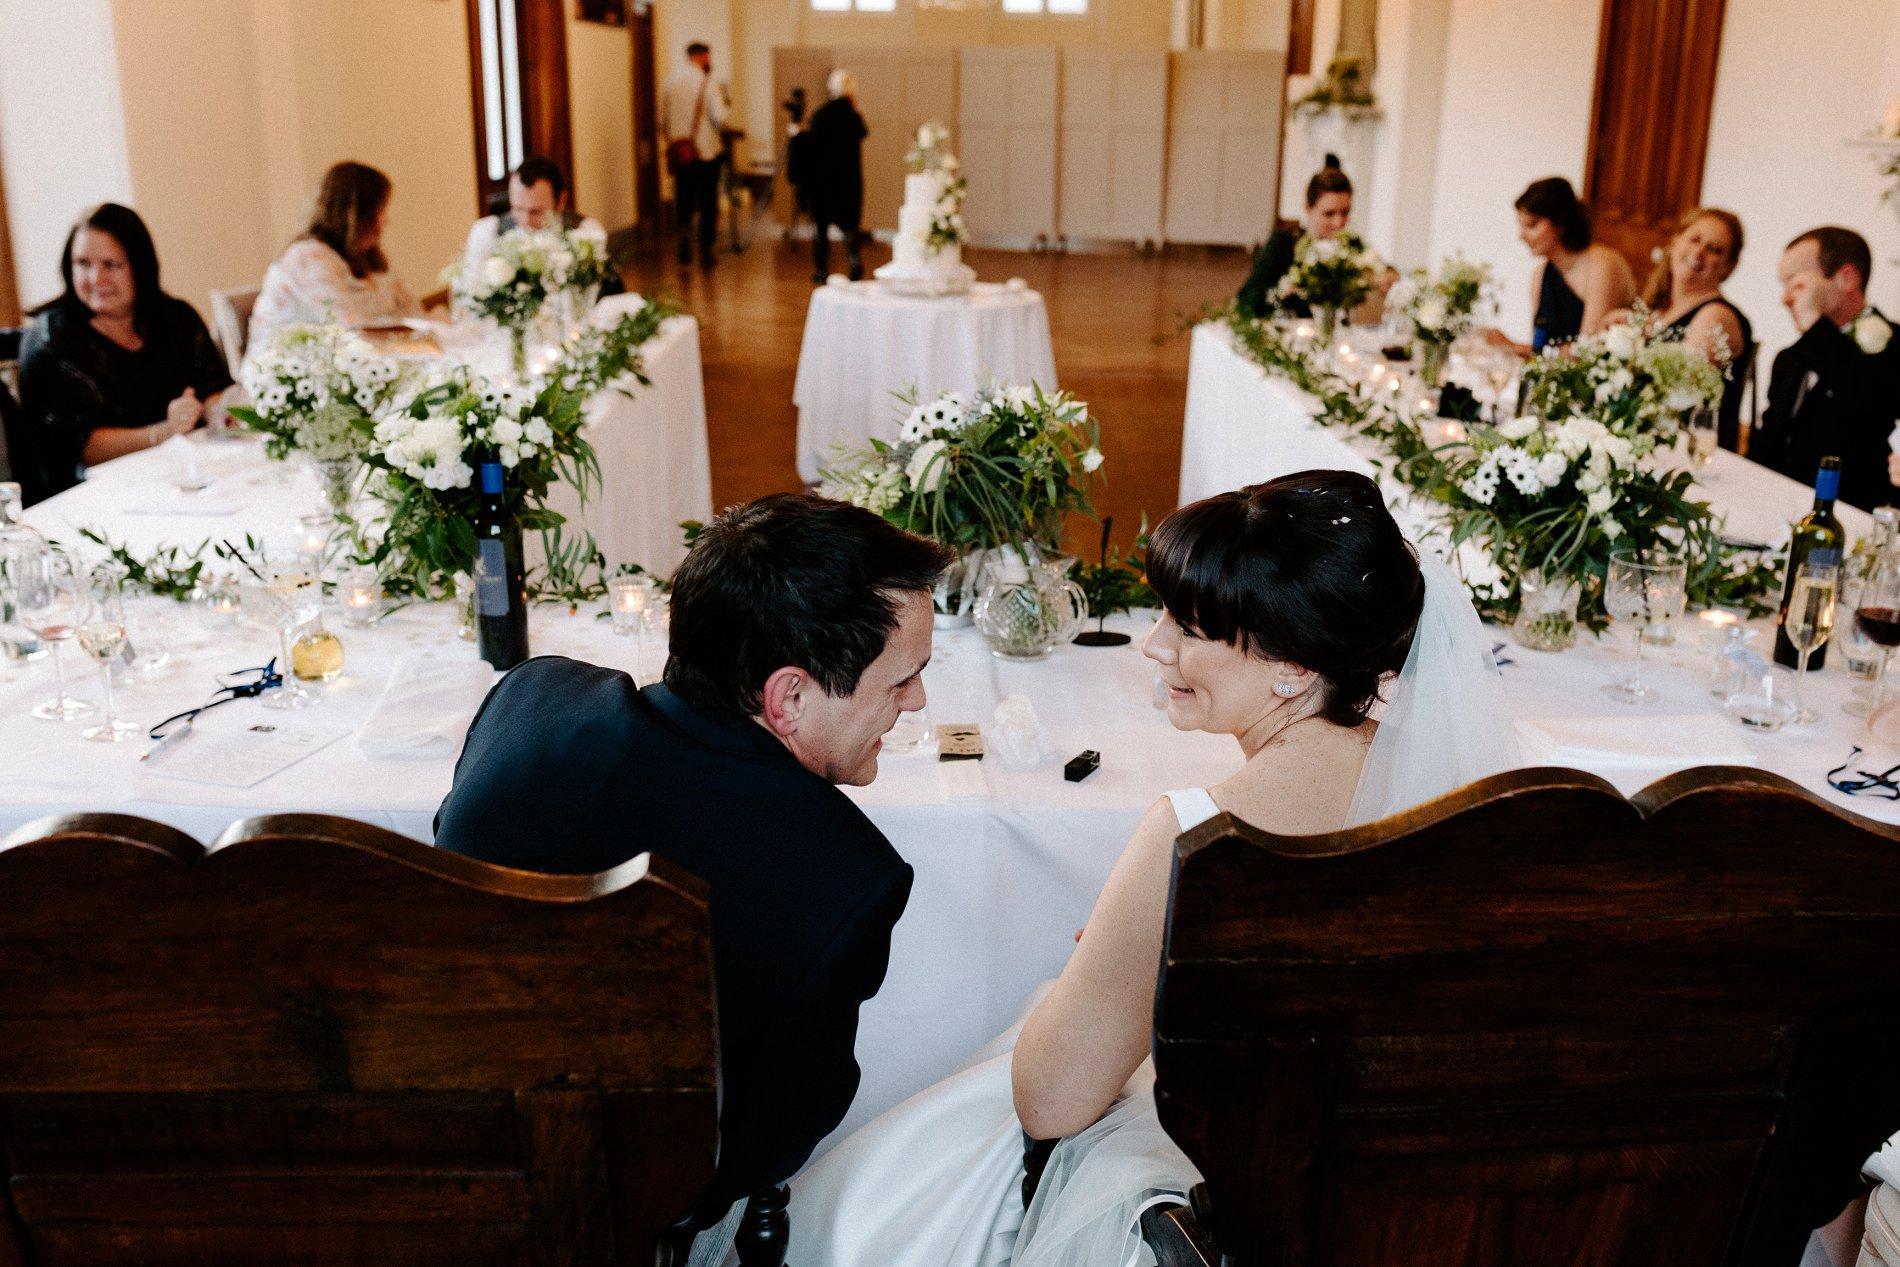 An Elegant White Wedding at Thicket Priory (c) Carla Whittingham Photography (75)